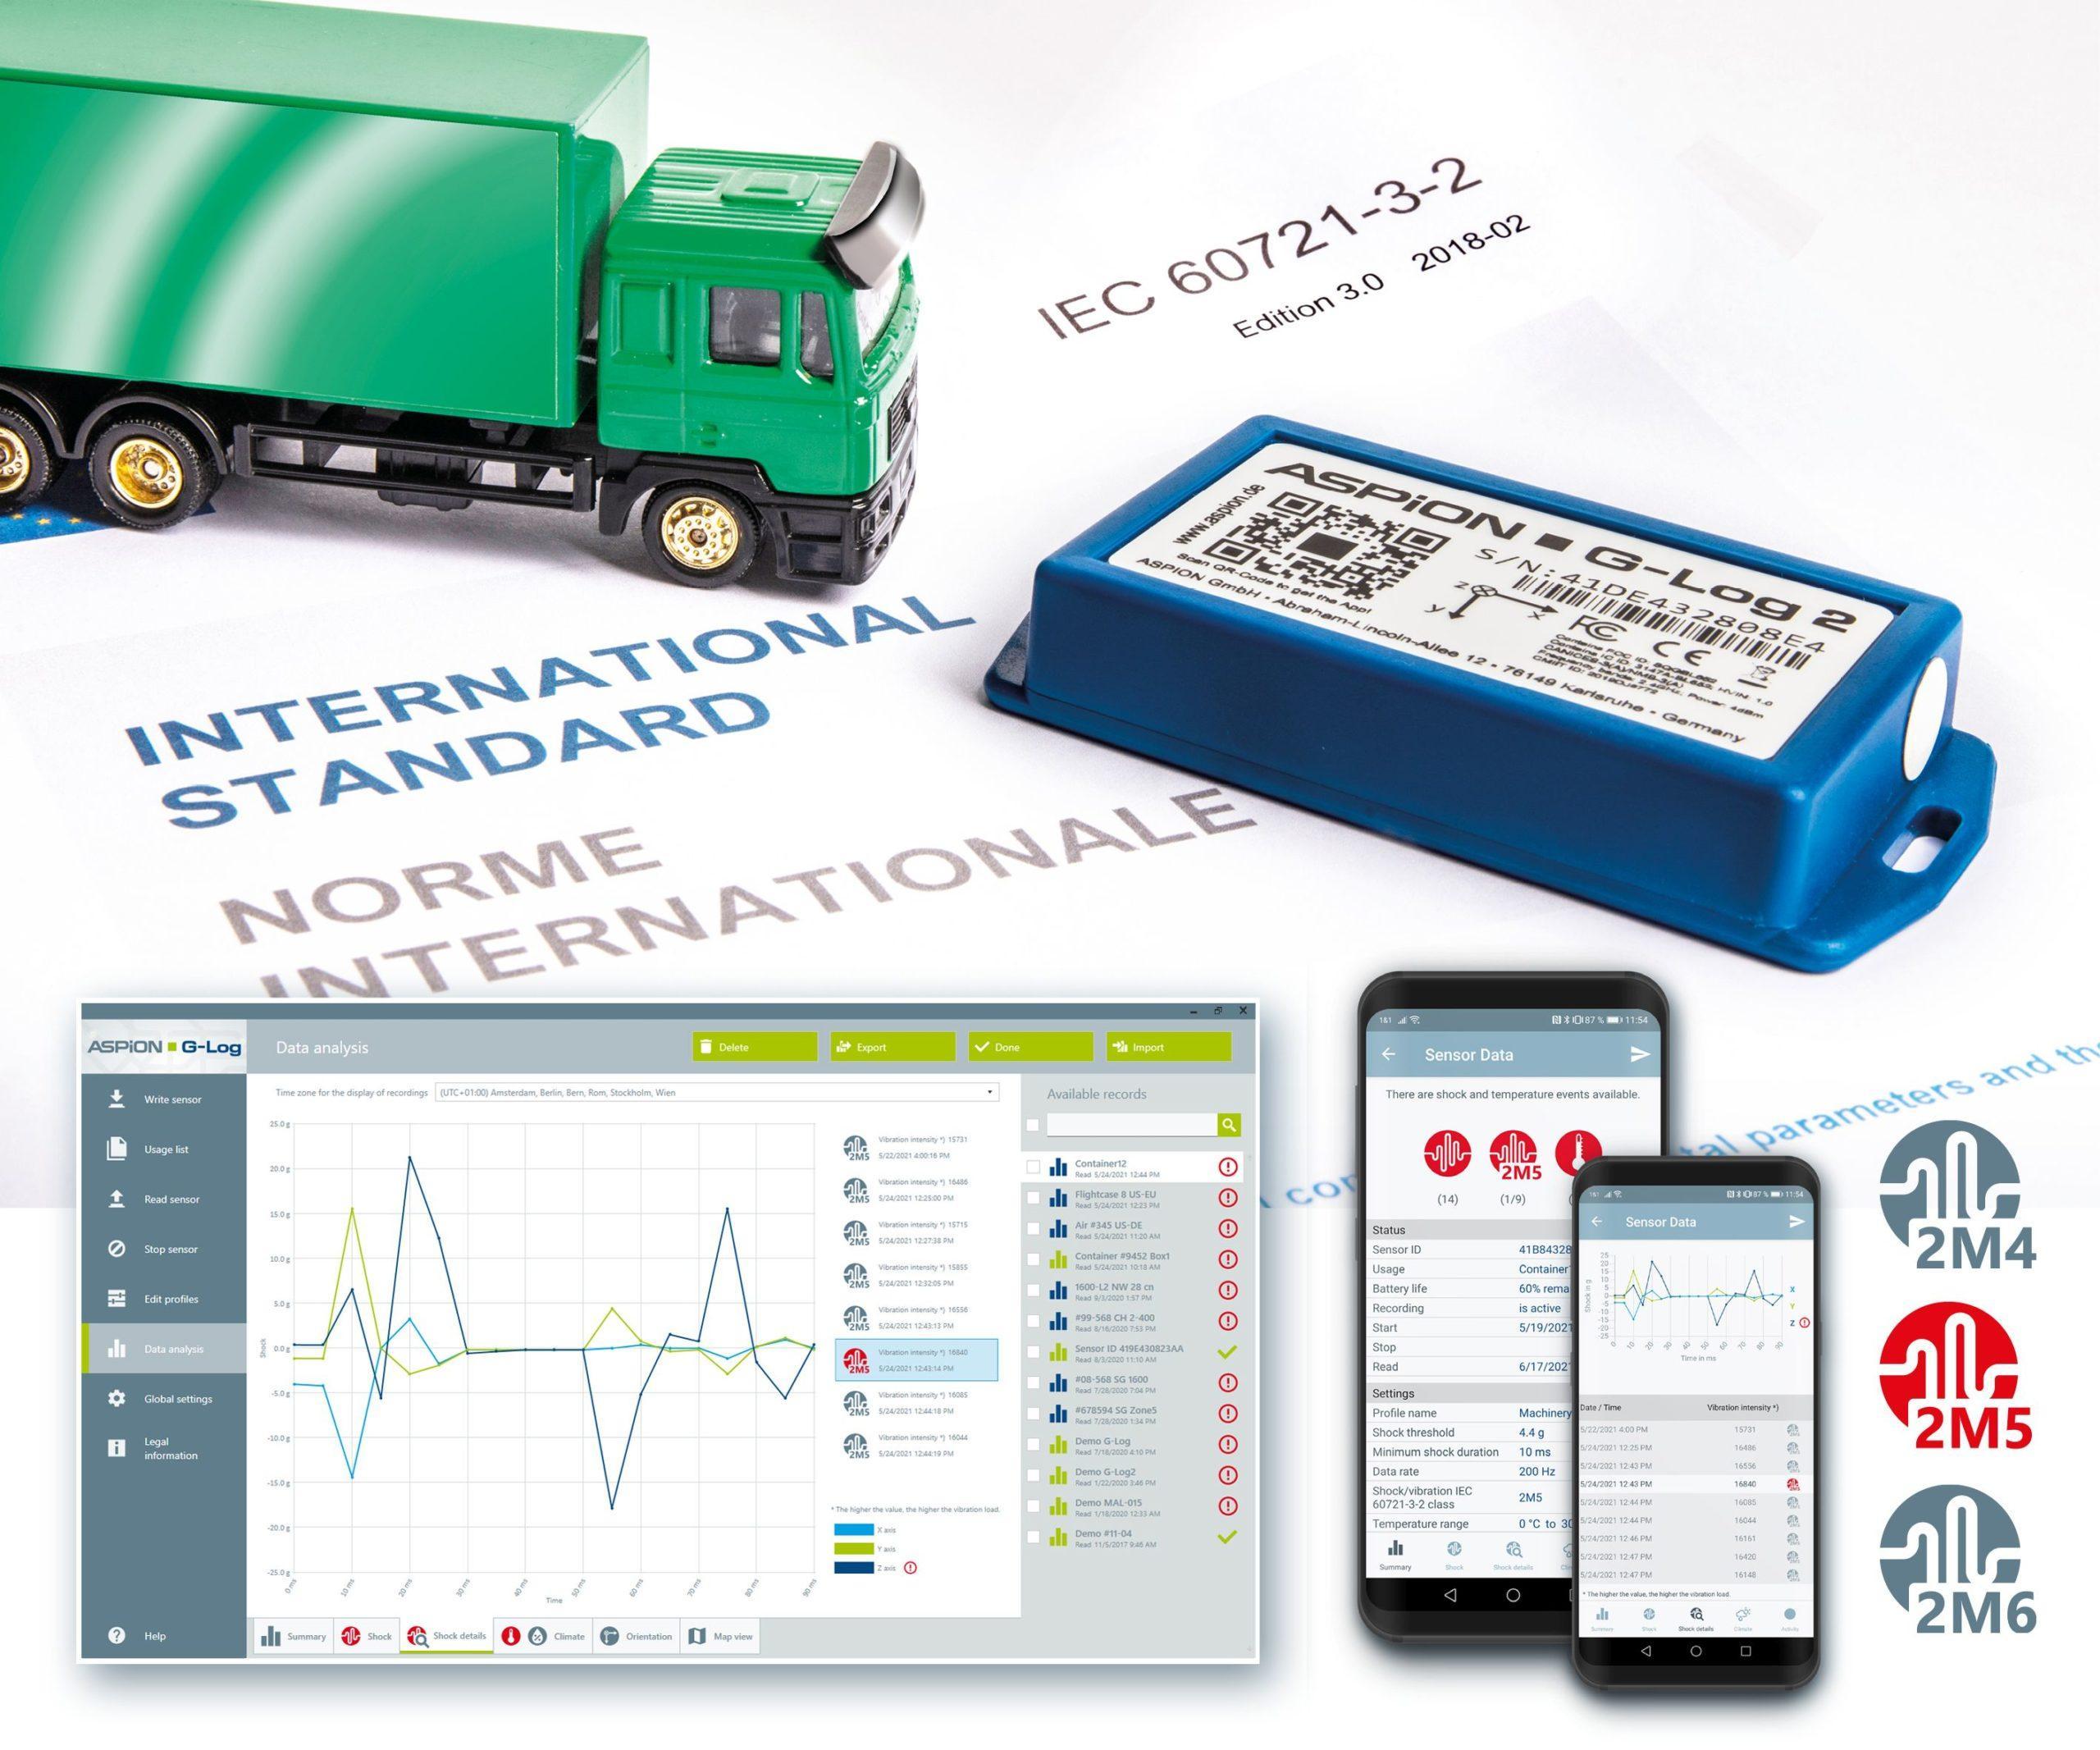 ASPION data logger monitors transport standard